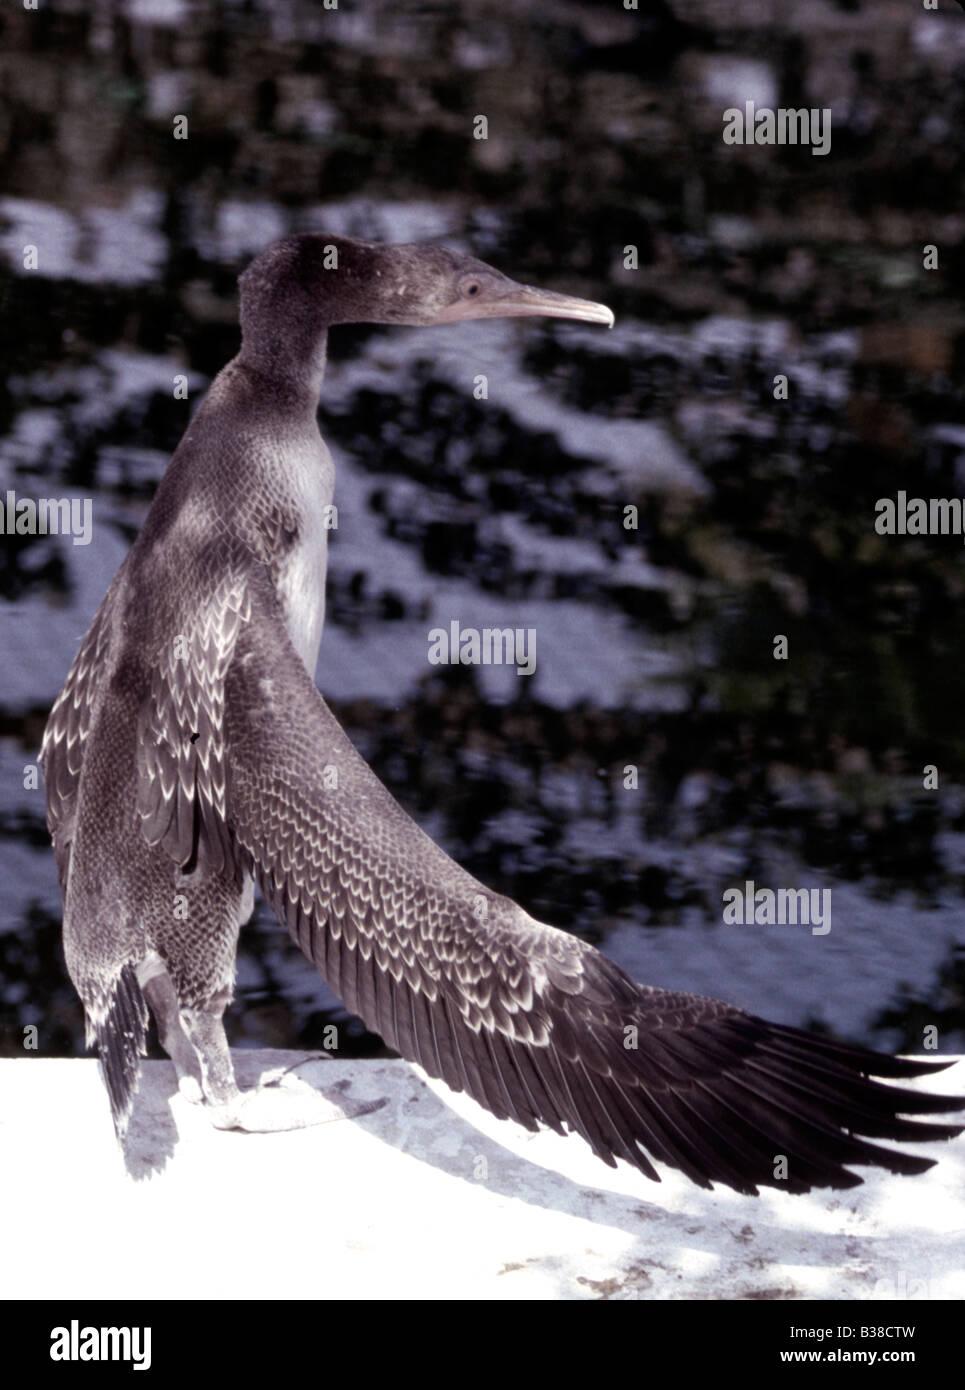 Socotra Cormorant (juvenile) Phalacrocorax nigrogularis (captive) during the Gulf eco disaster 1991 - Stock Image